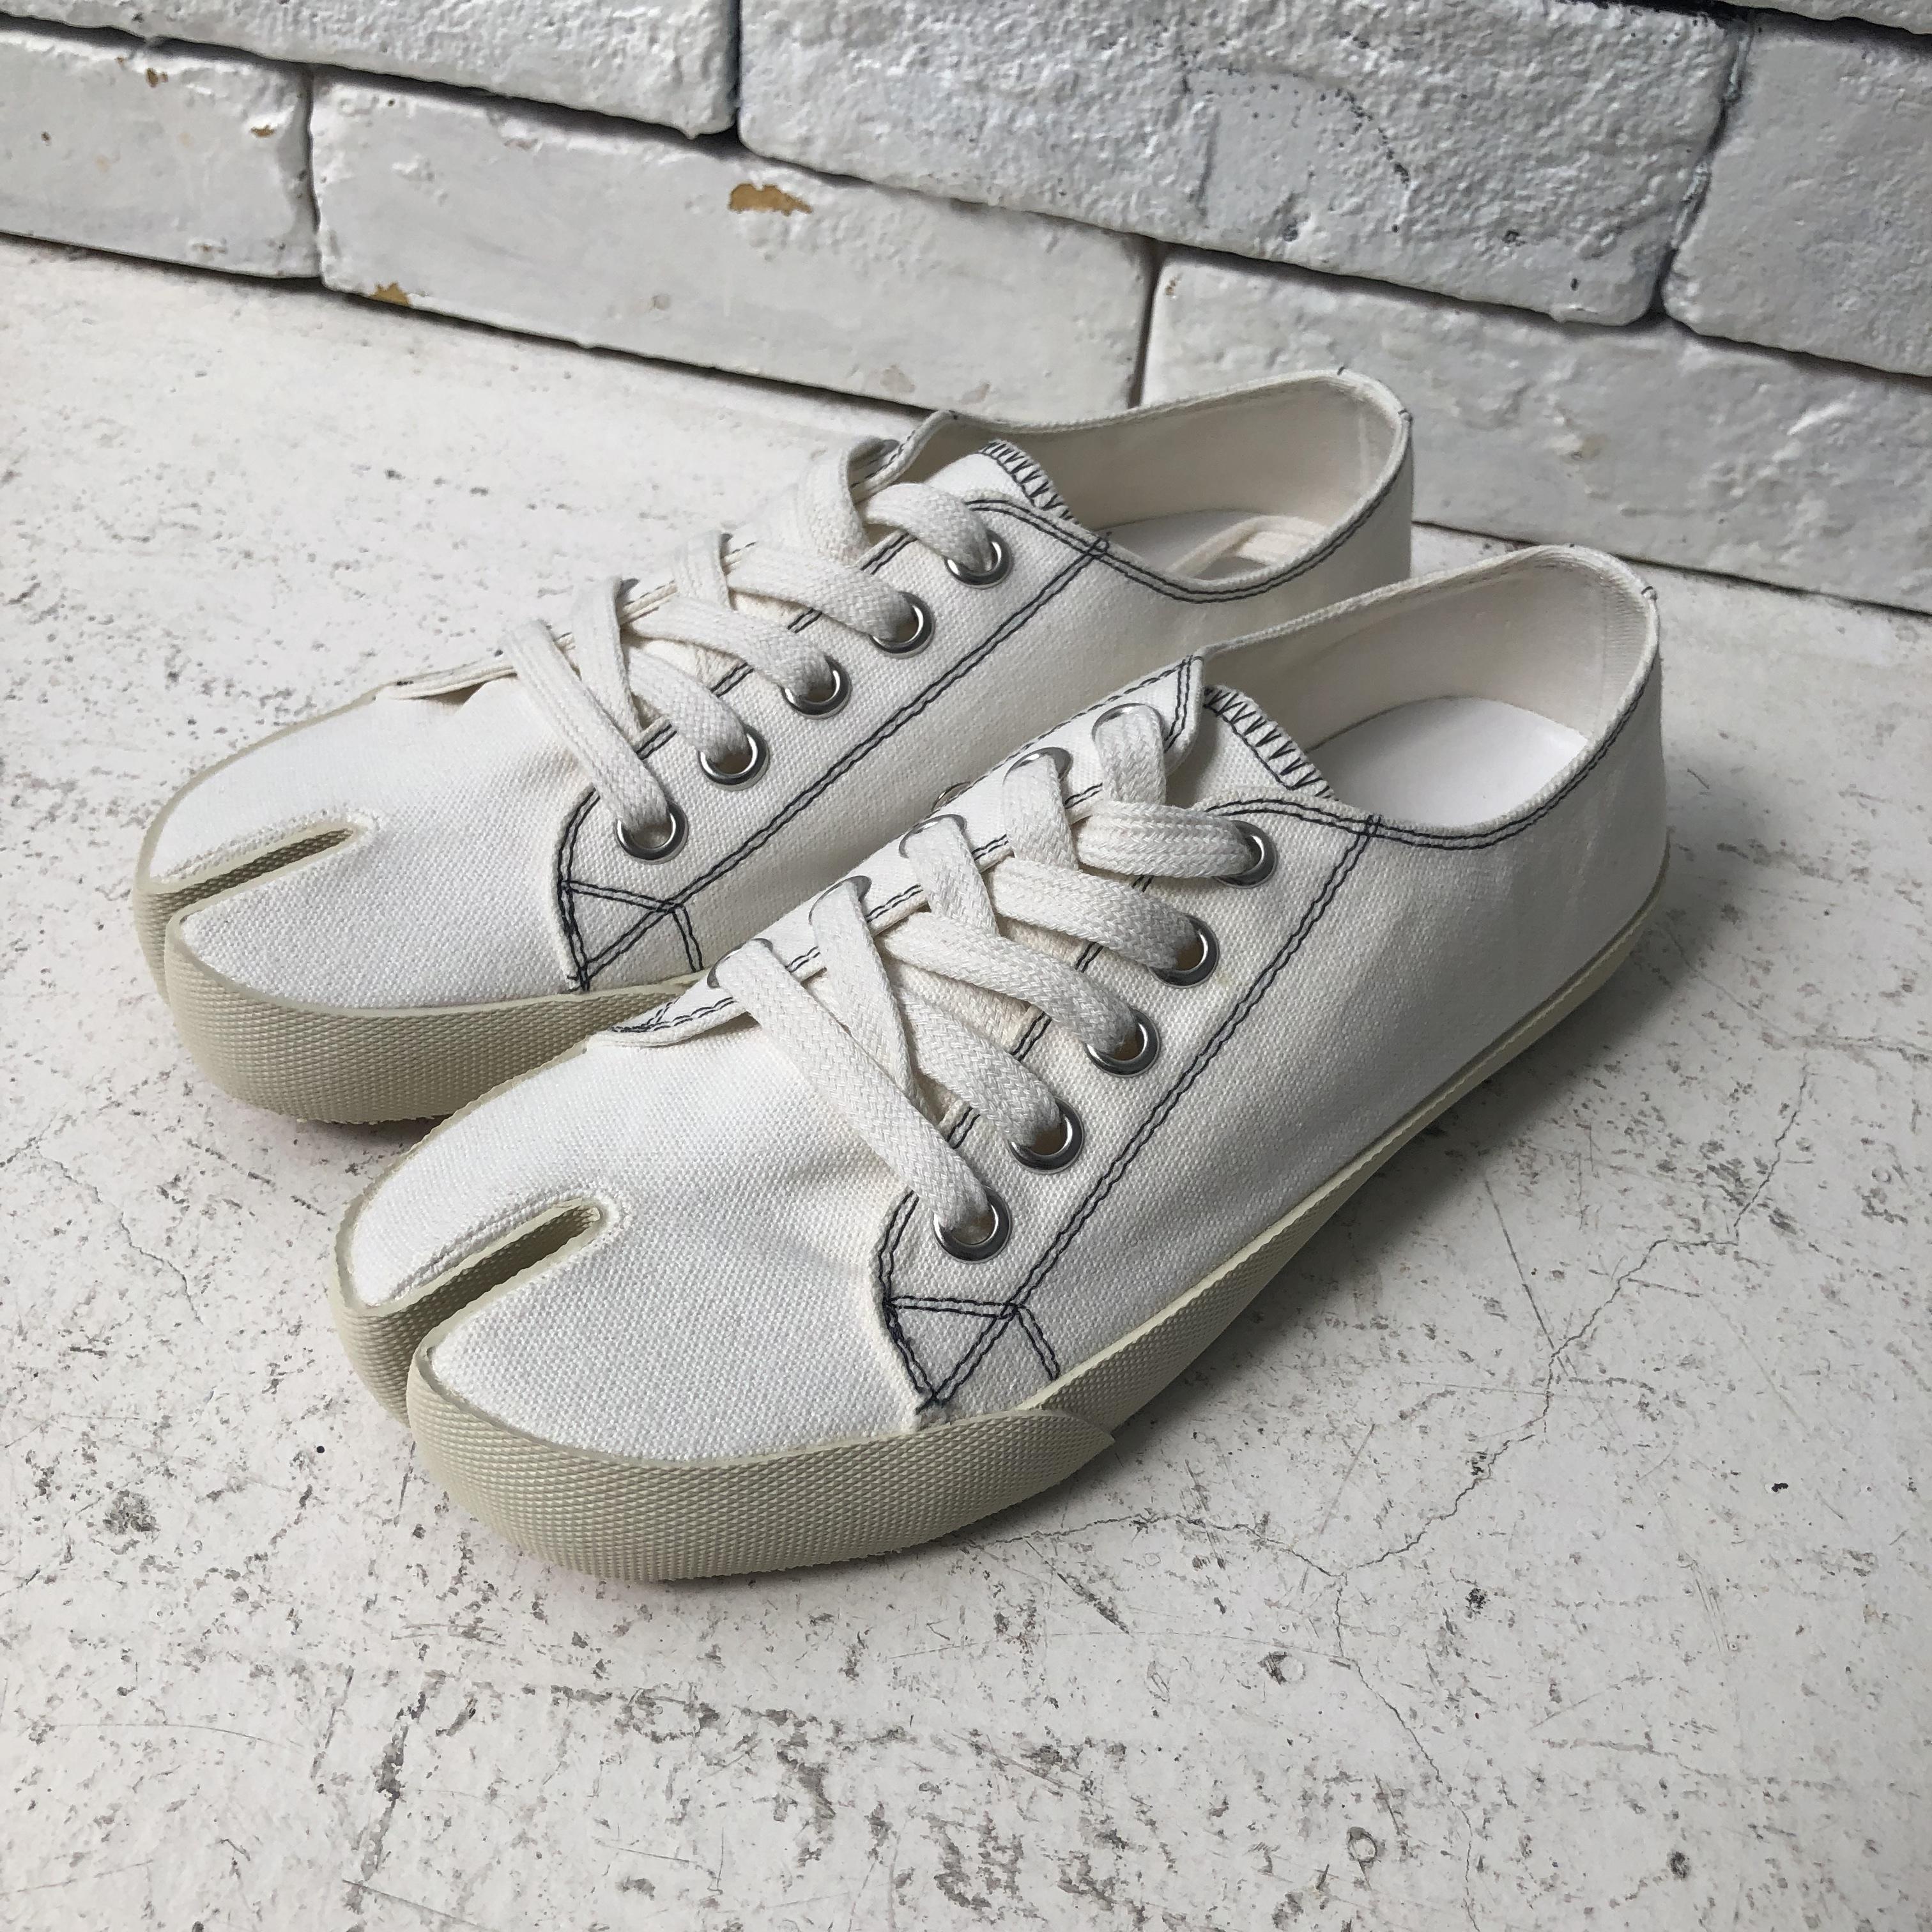 Tabi-shoes